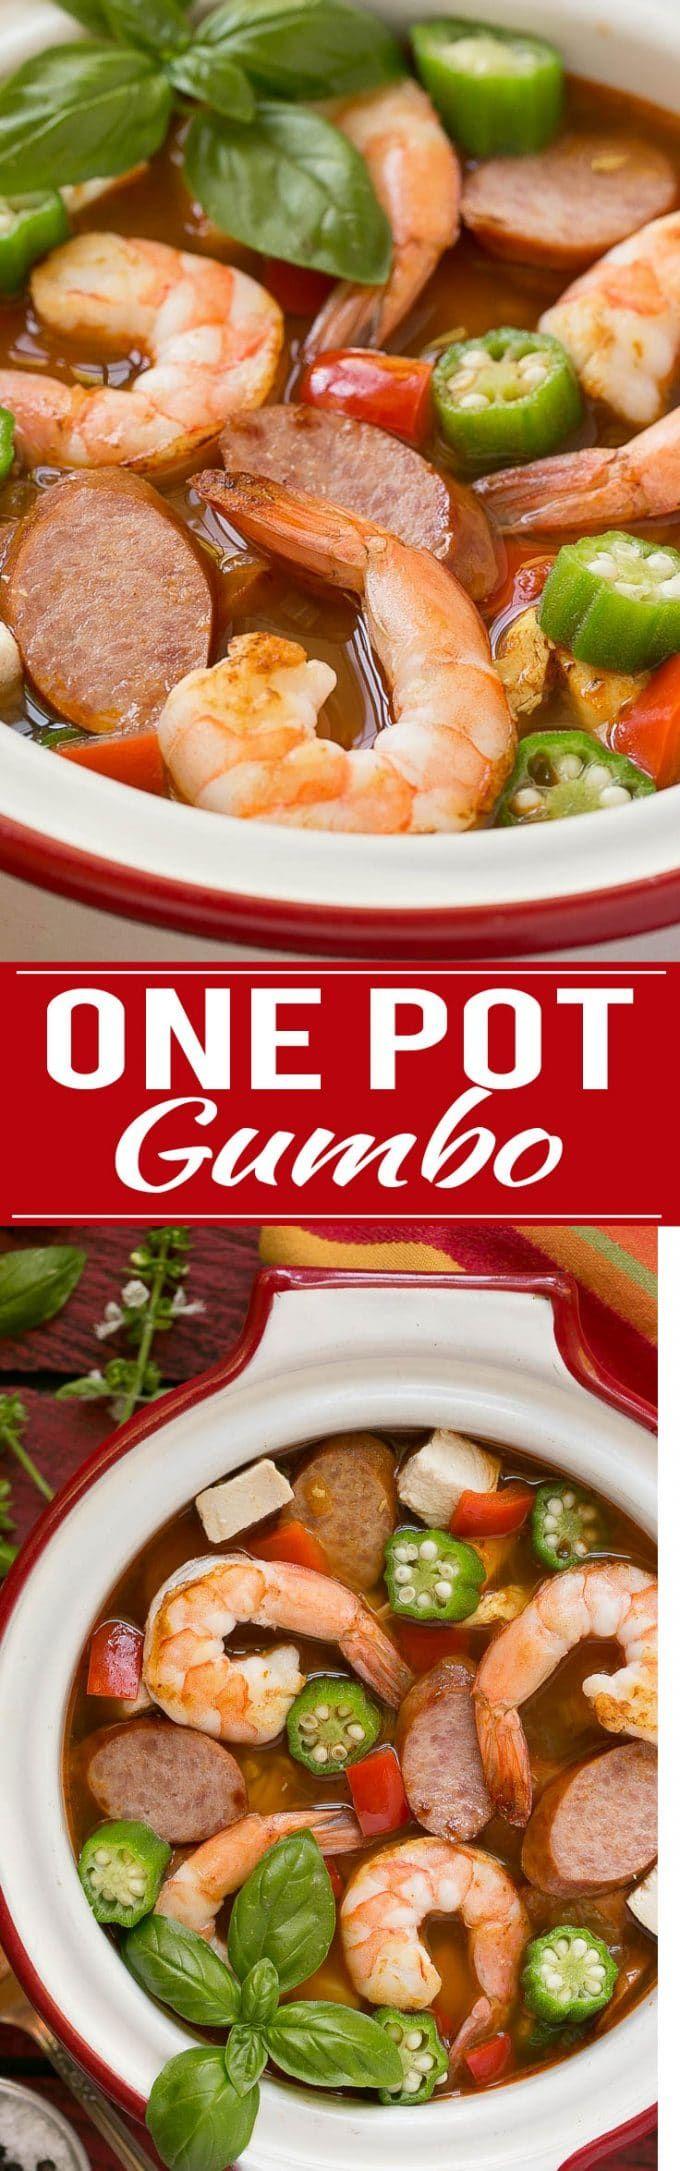 One Pot Chicken and Shrimp Gumbo Recipe | Easy Chicken and Shrimp Gumbo | One Pot Chicken and Shrimp Gumbo | Best Chicken and Shrimp Gumbo | Best Chicken and Shrimp Gumbo | Best One Pot Gumbo | Easy One Pot Gumbo